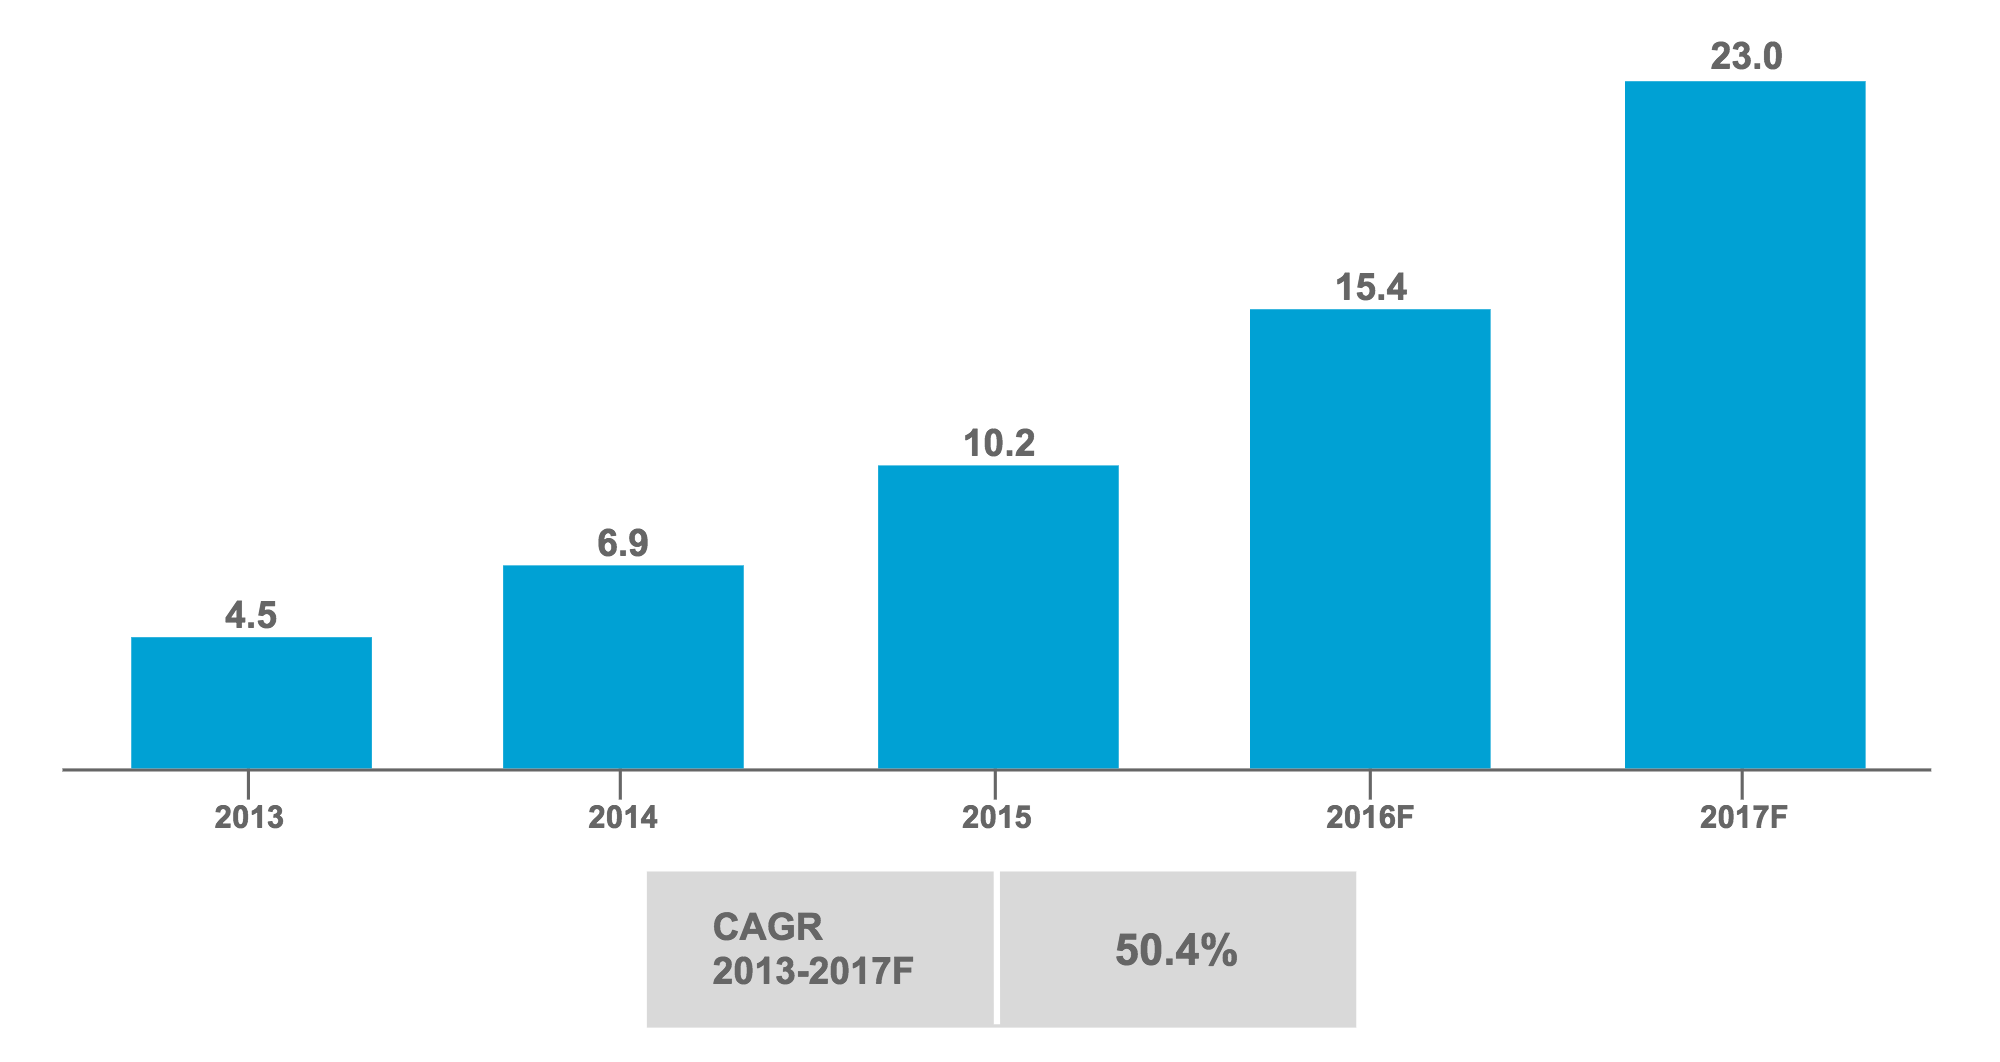 Global Mobile Health Revenue